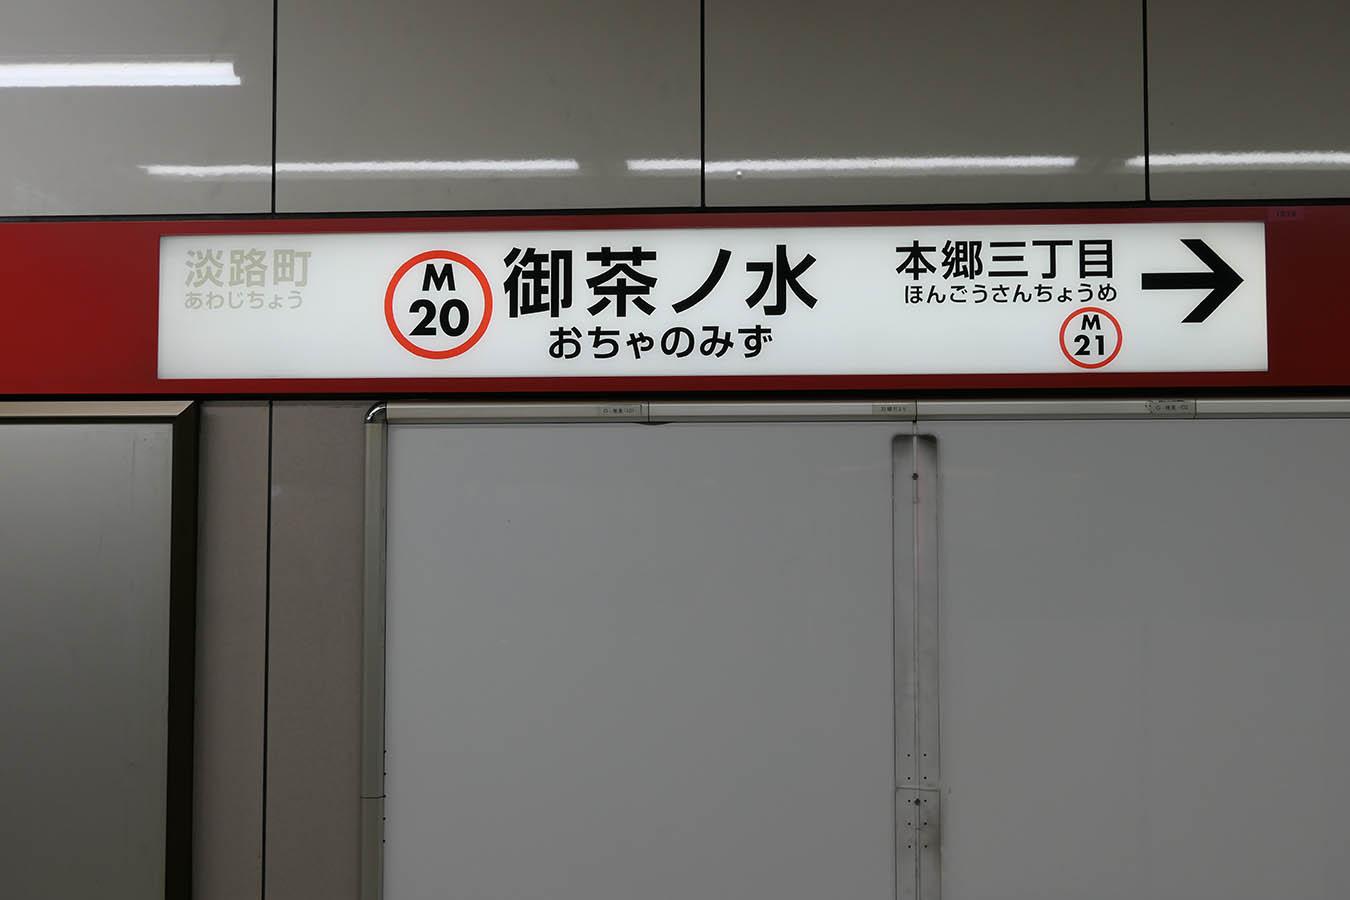 M20_photo05.jpg